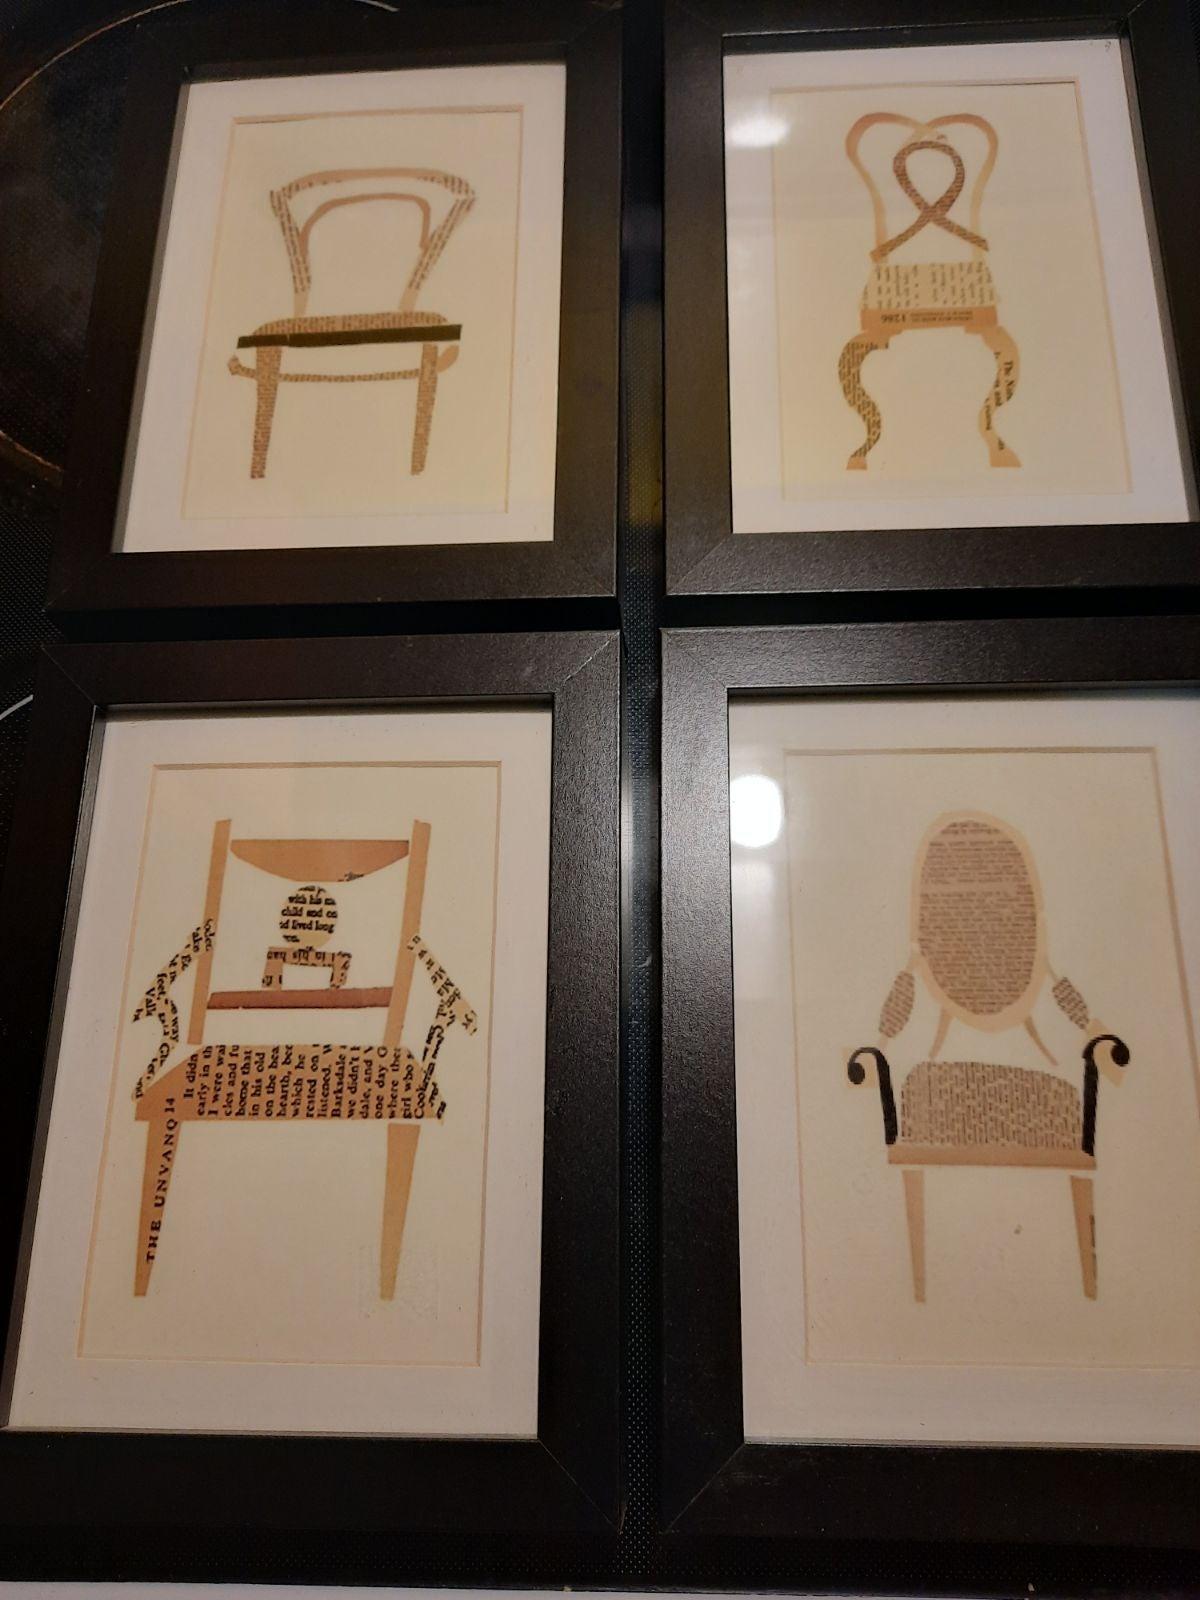 4 chair art photos